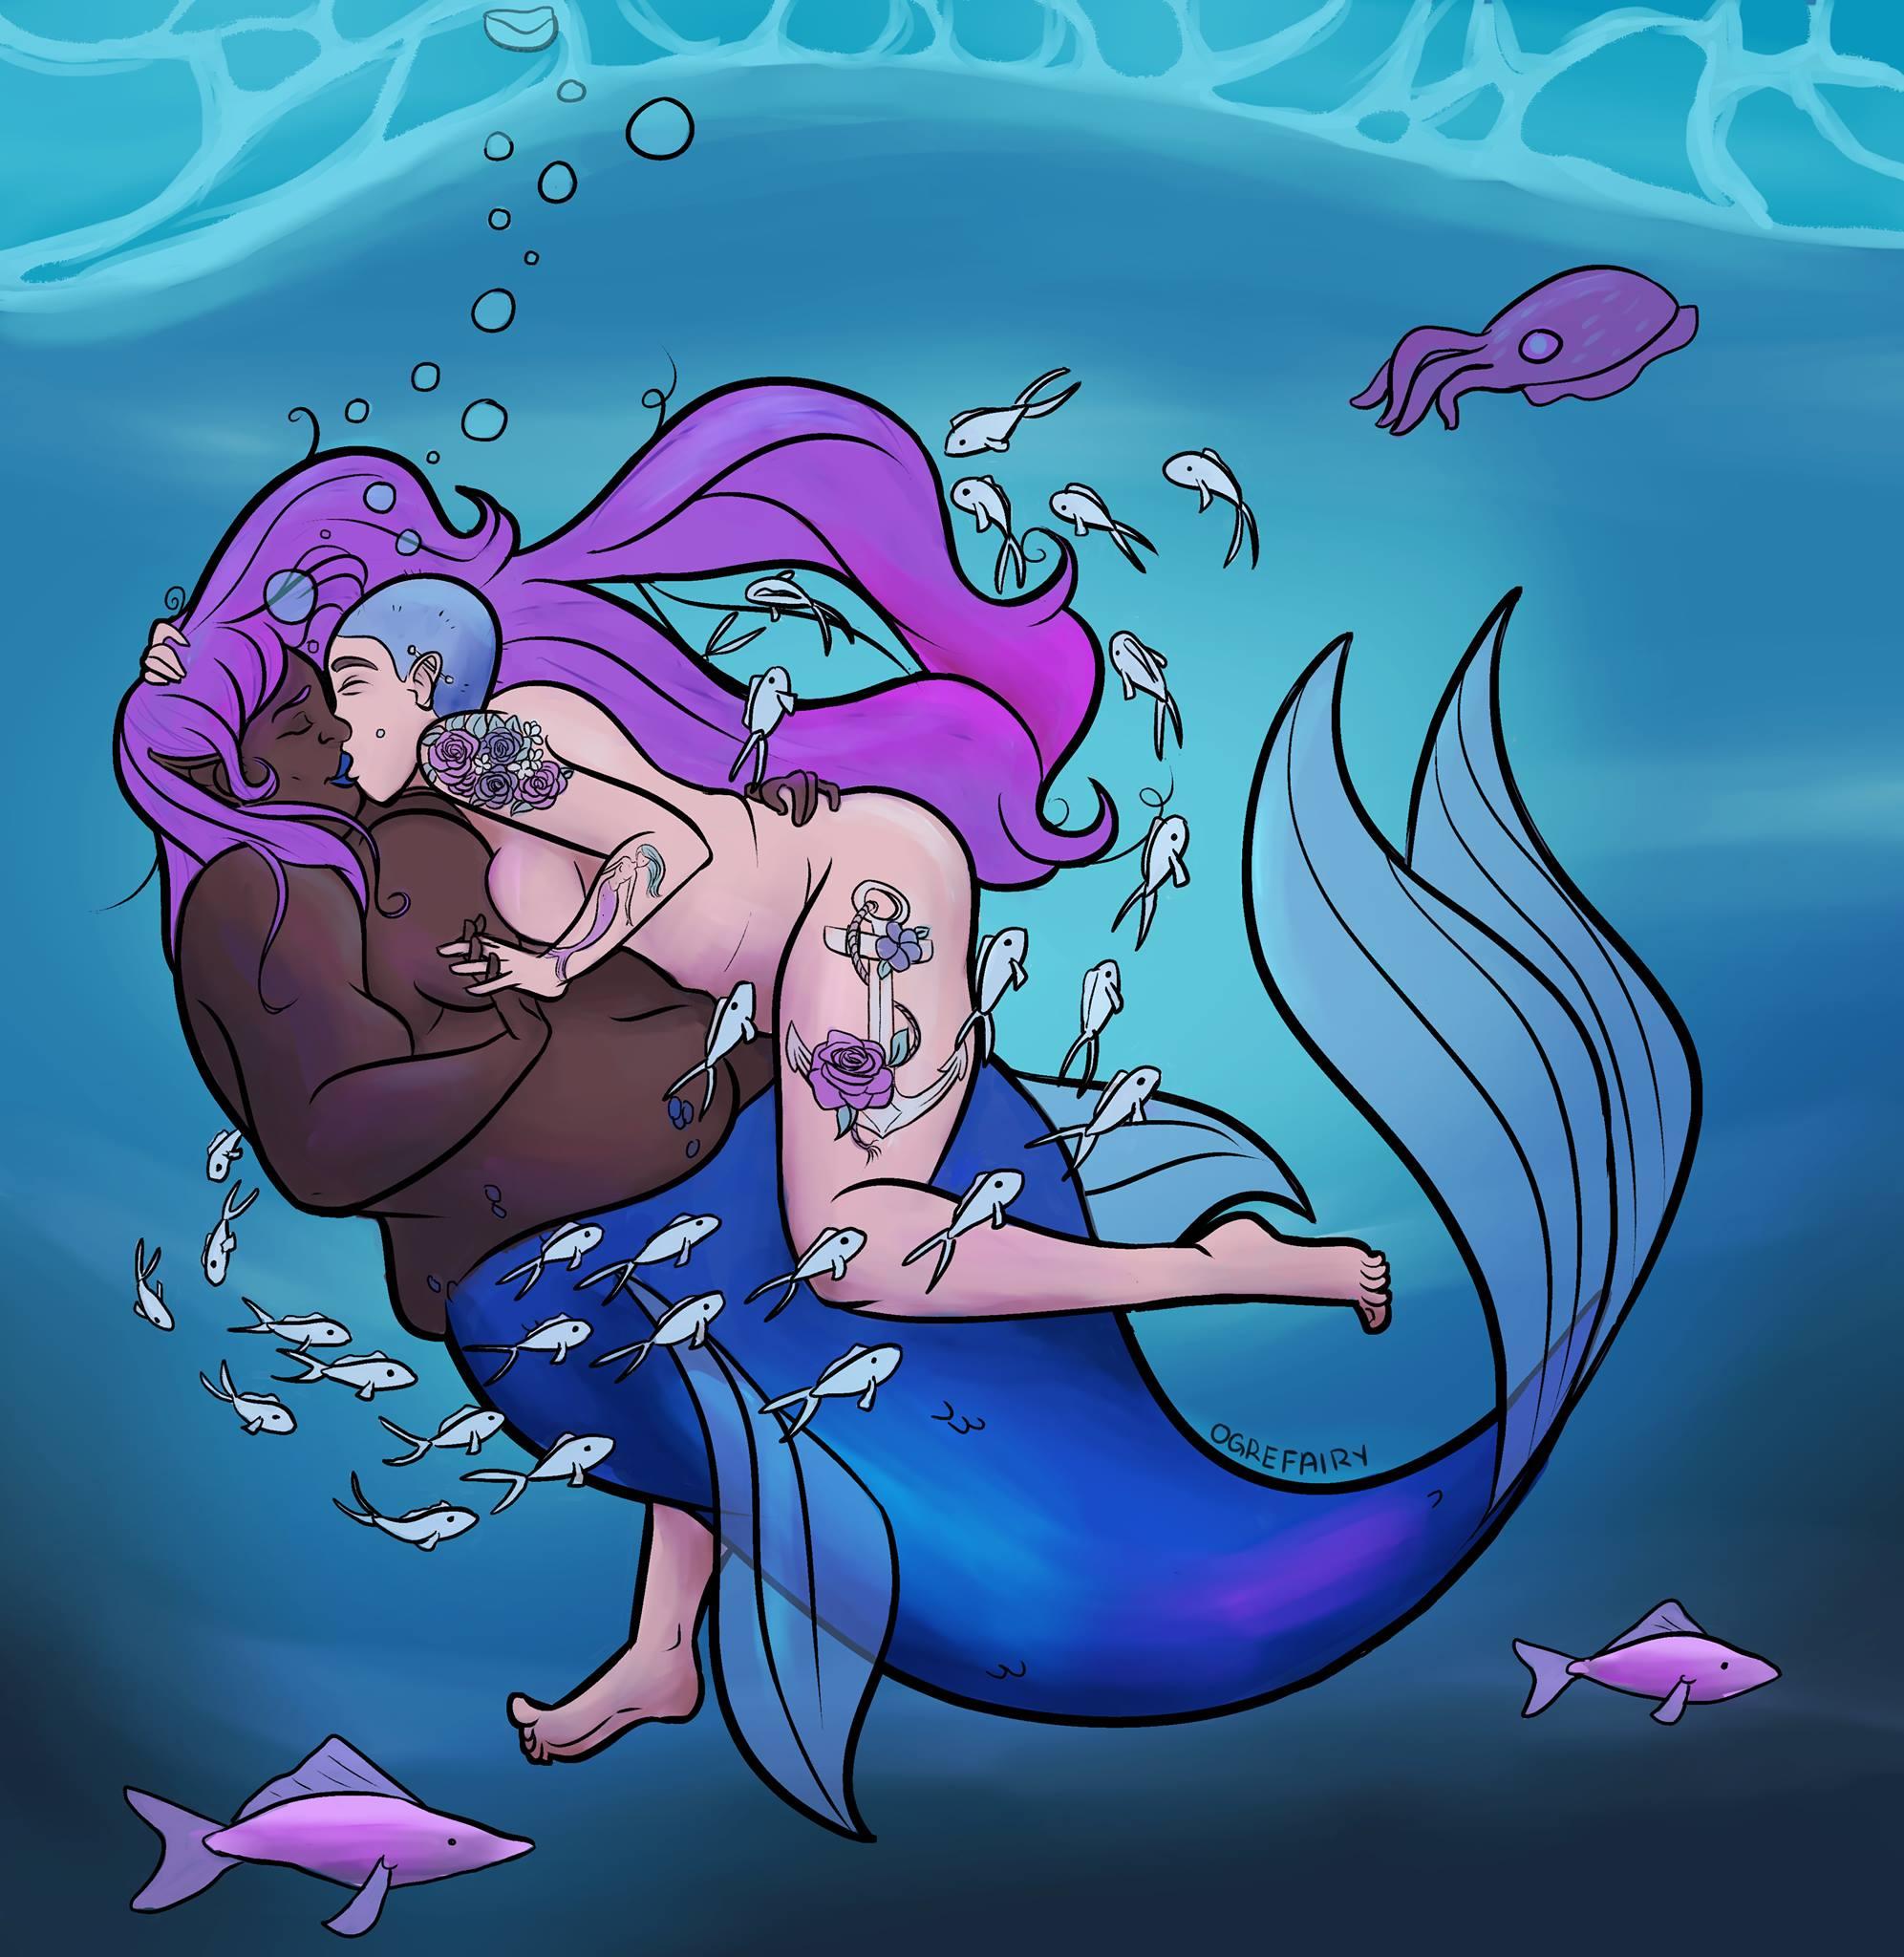 A Mermaid's Embrace